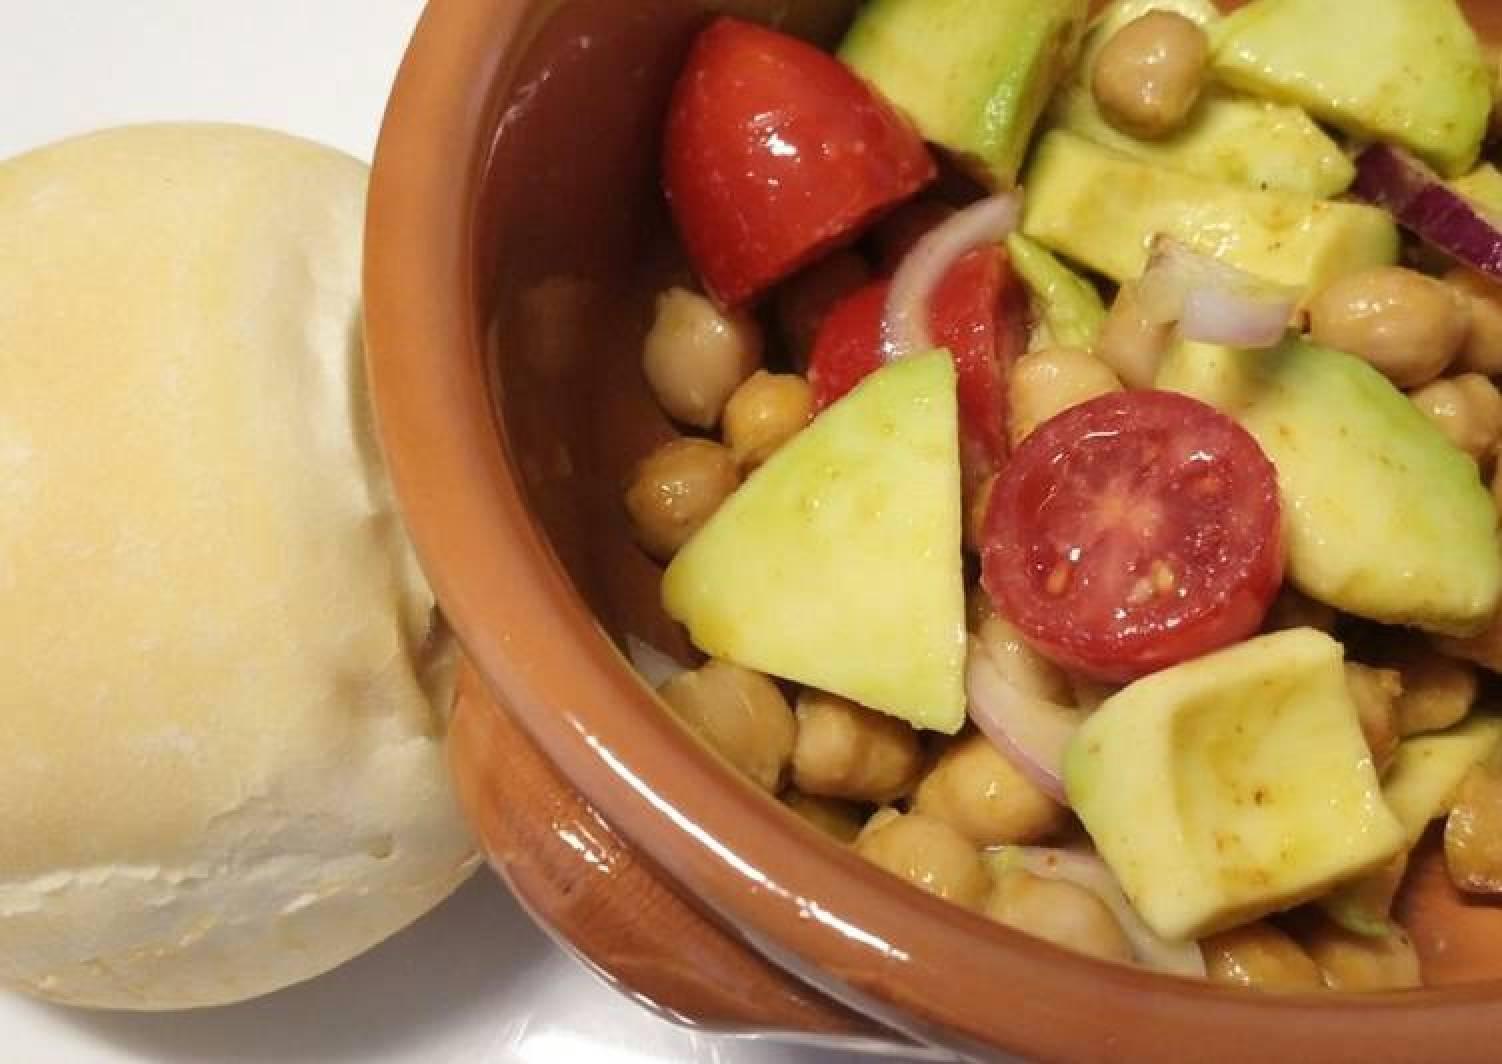 Roasted chickpea and avocado salad